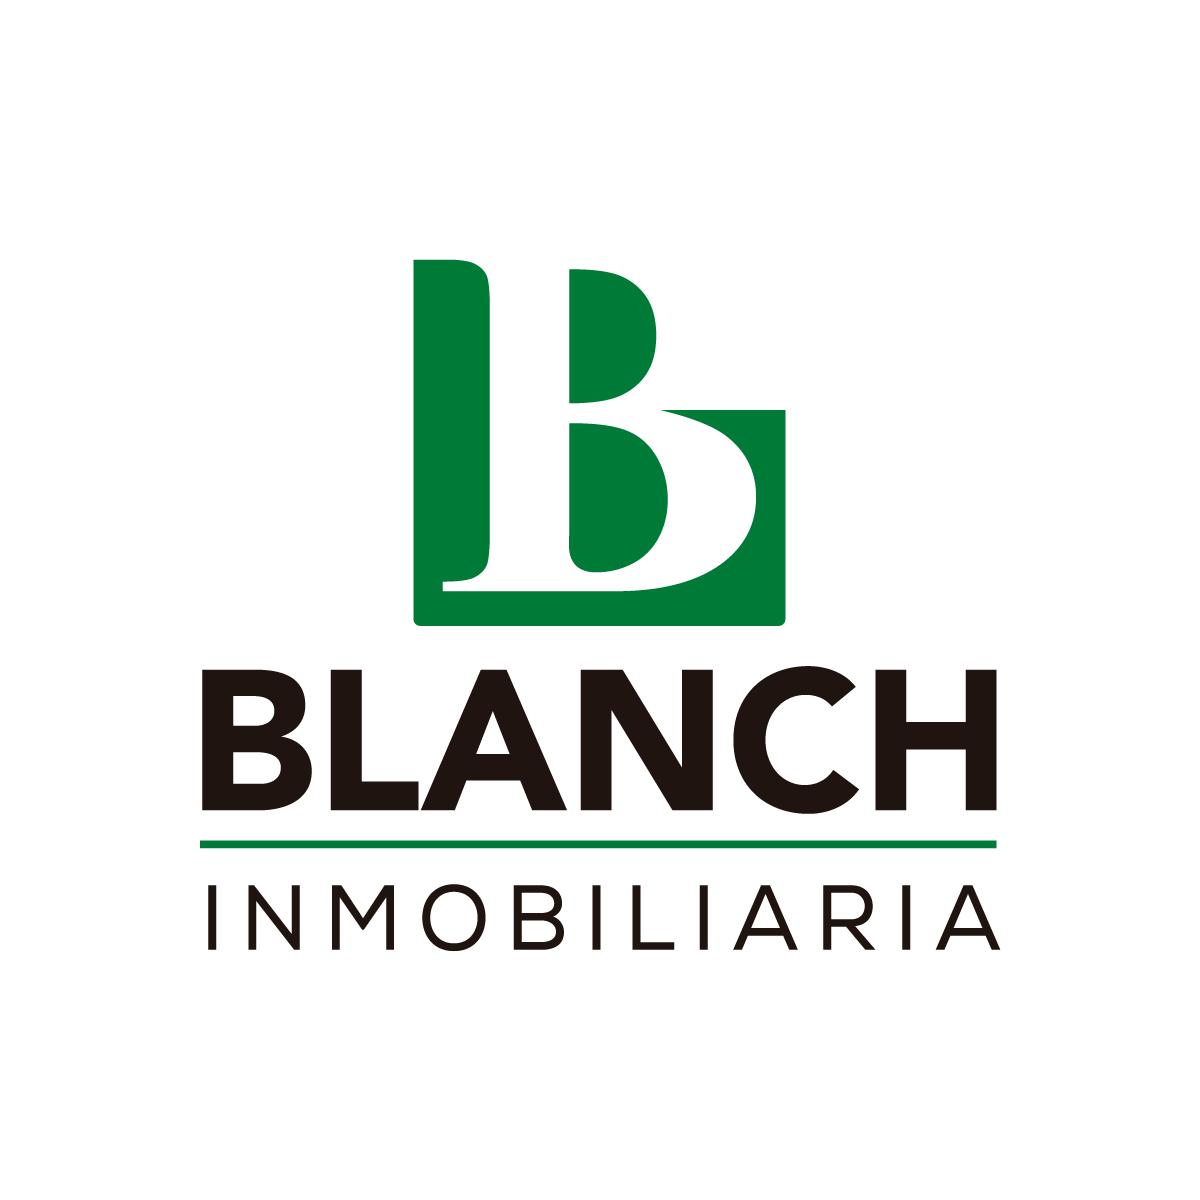 BLANCH Inmobiliaria